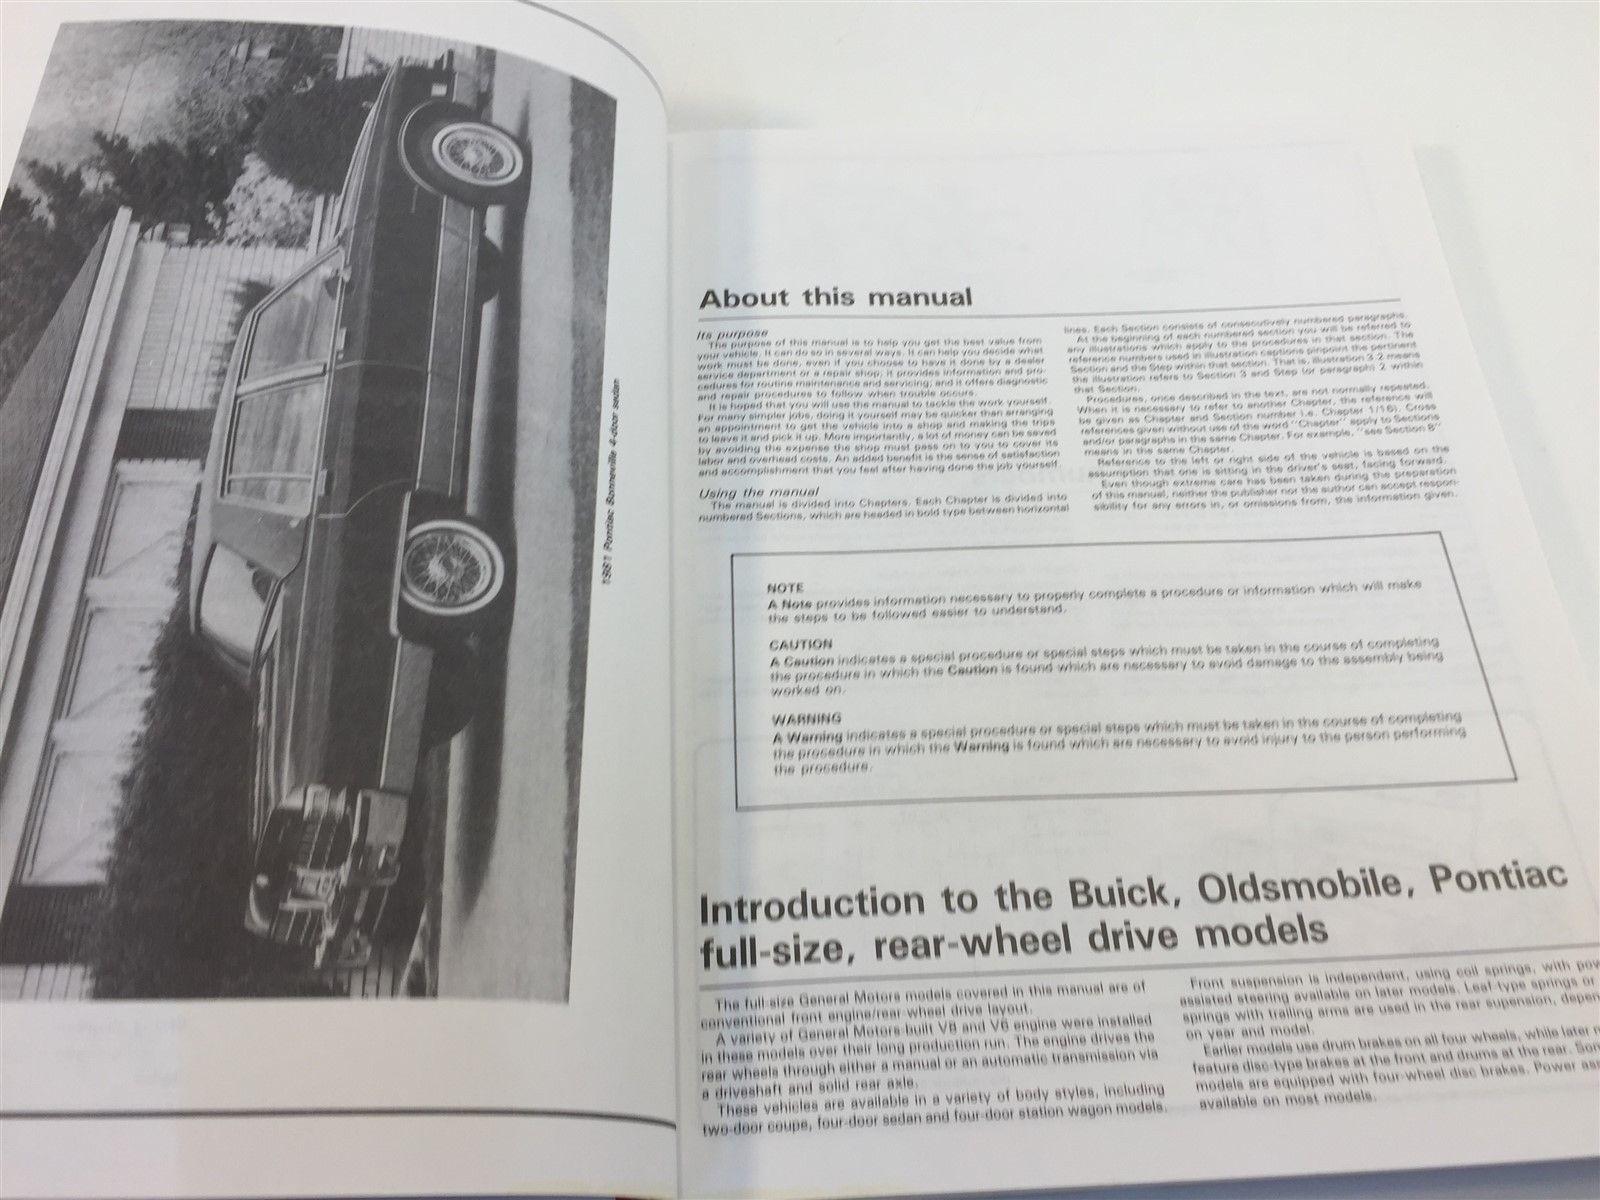 1970-1990 Buick Olds Pontiac Full Size Models Automotive Repair Manual Haynes